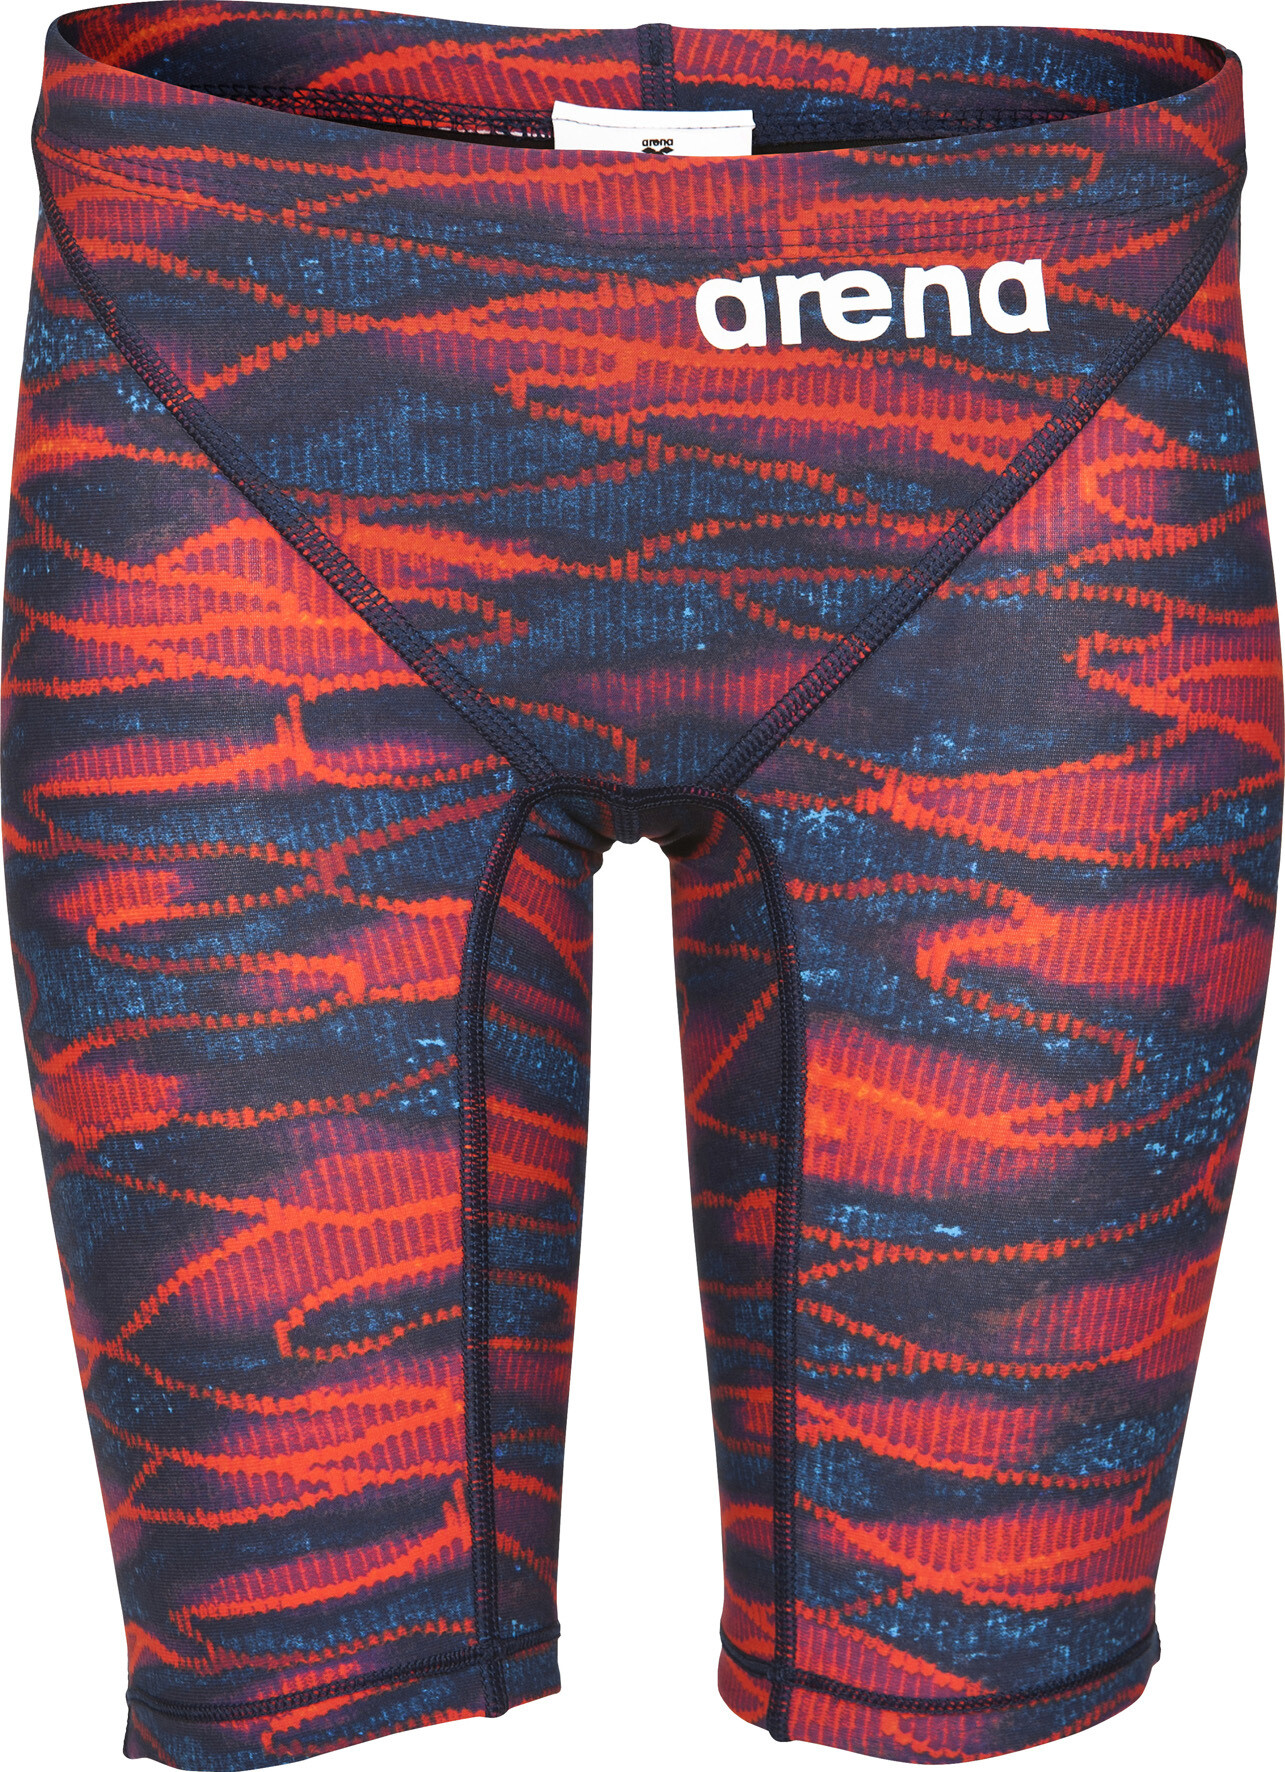 2260a85c1d arena Powerskin ST 2.0 LTD Edition Bathing Trunk Children red/blue ...